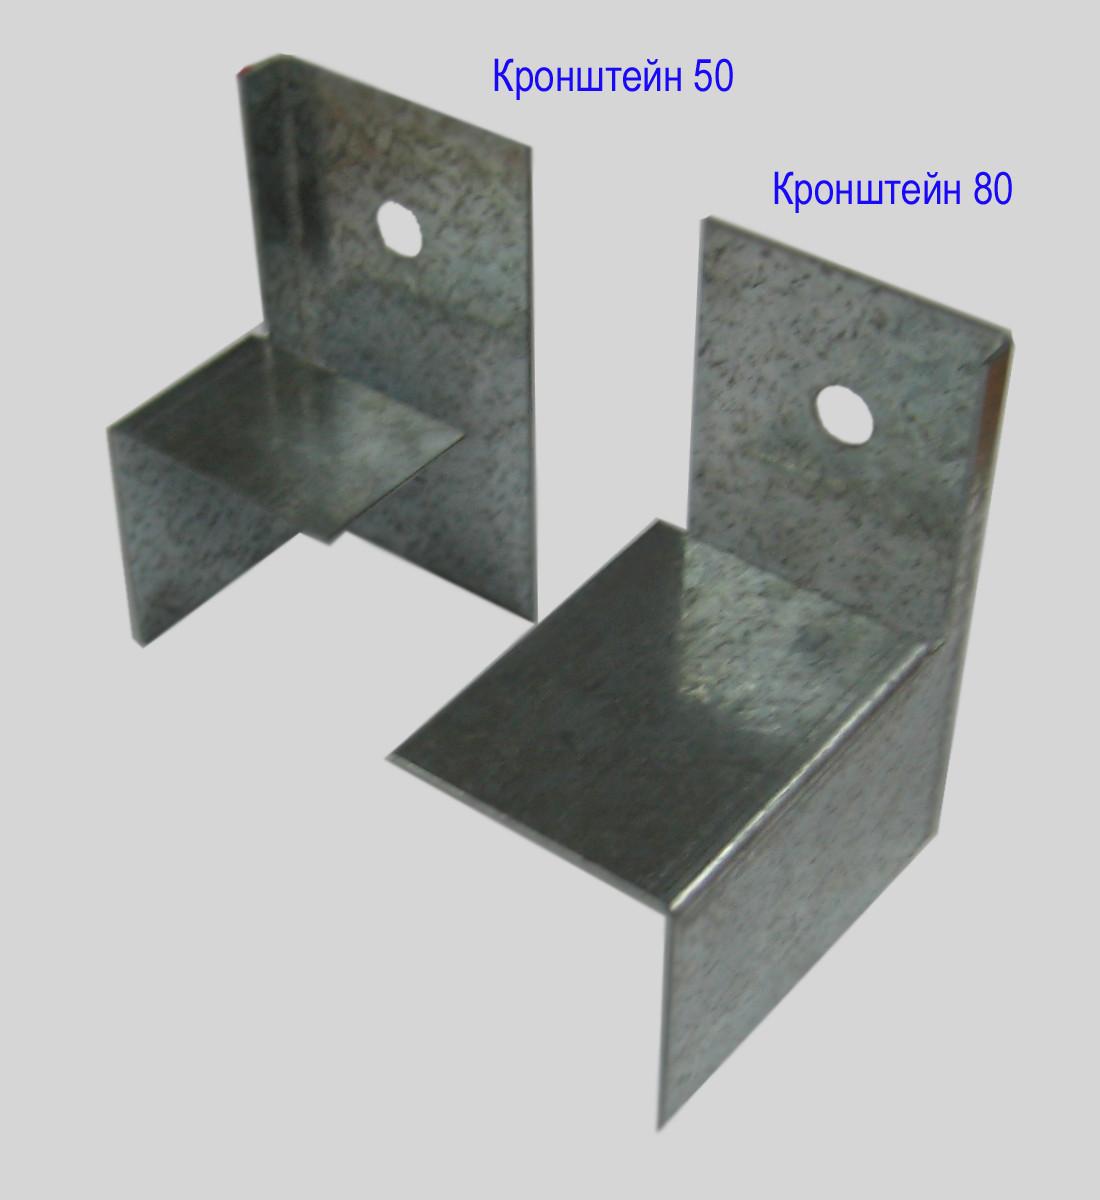 Кронштейн оцинкованный КР-120, тол. 1,2 мм